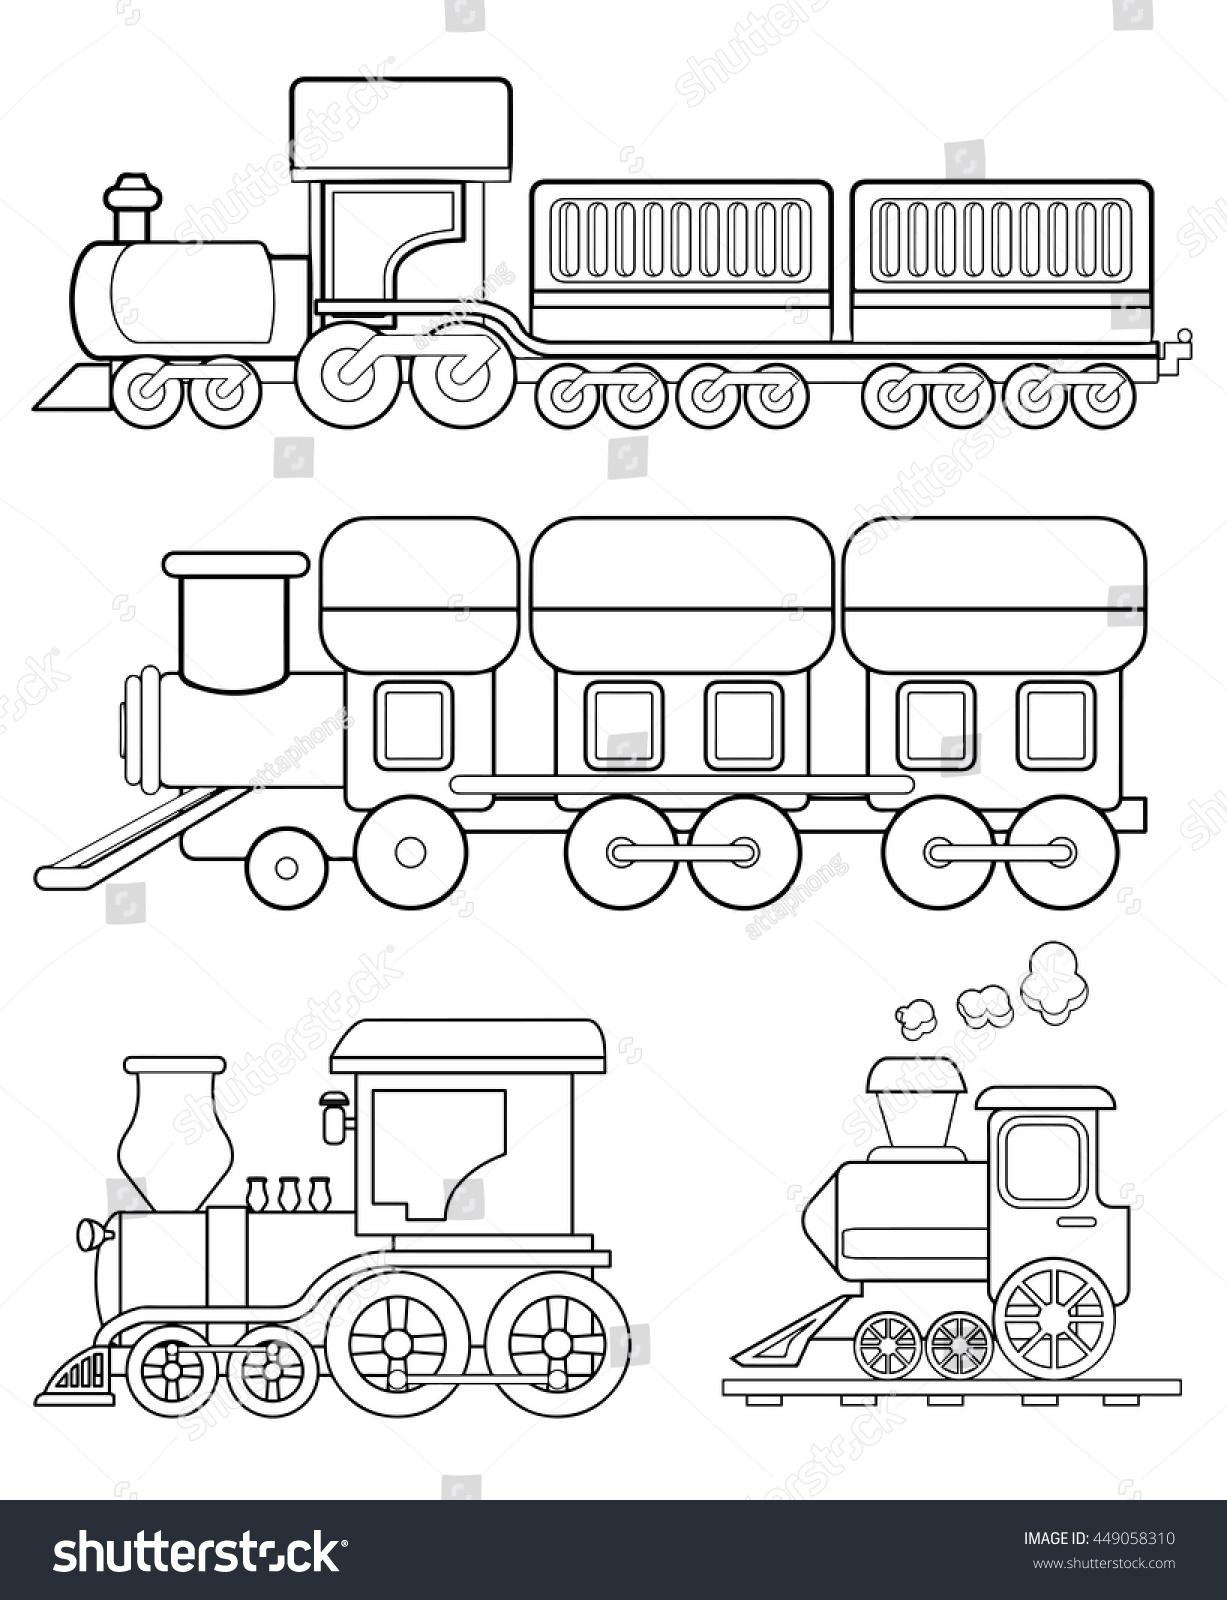 Train Coloring Page Vector Stock Vector